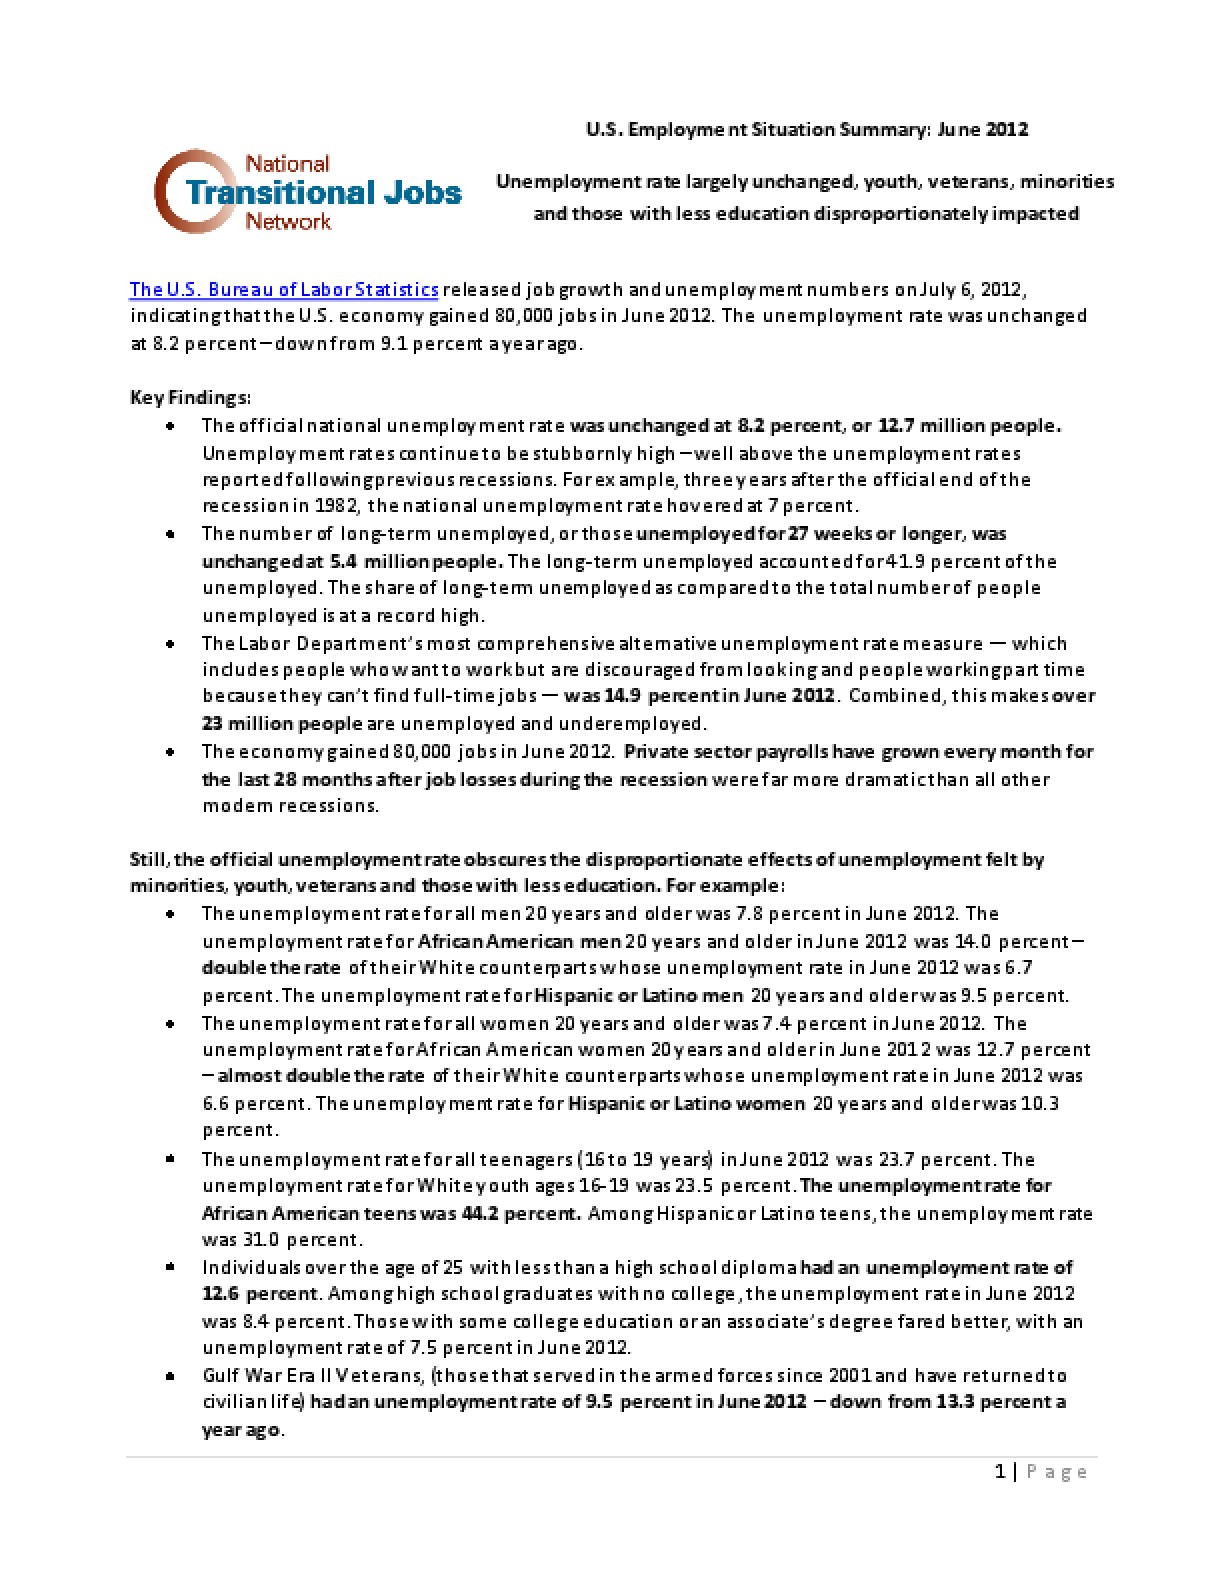 U.S. Employment Situation Summary: June 2012